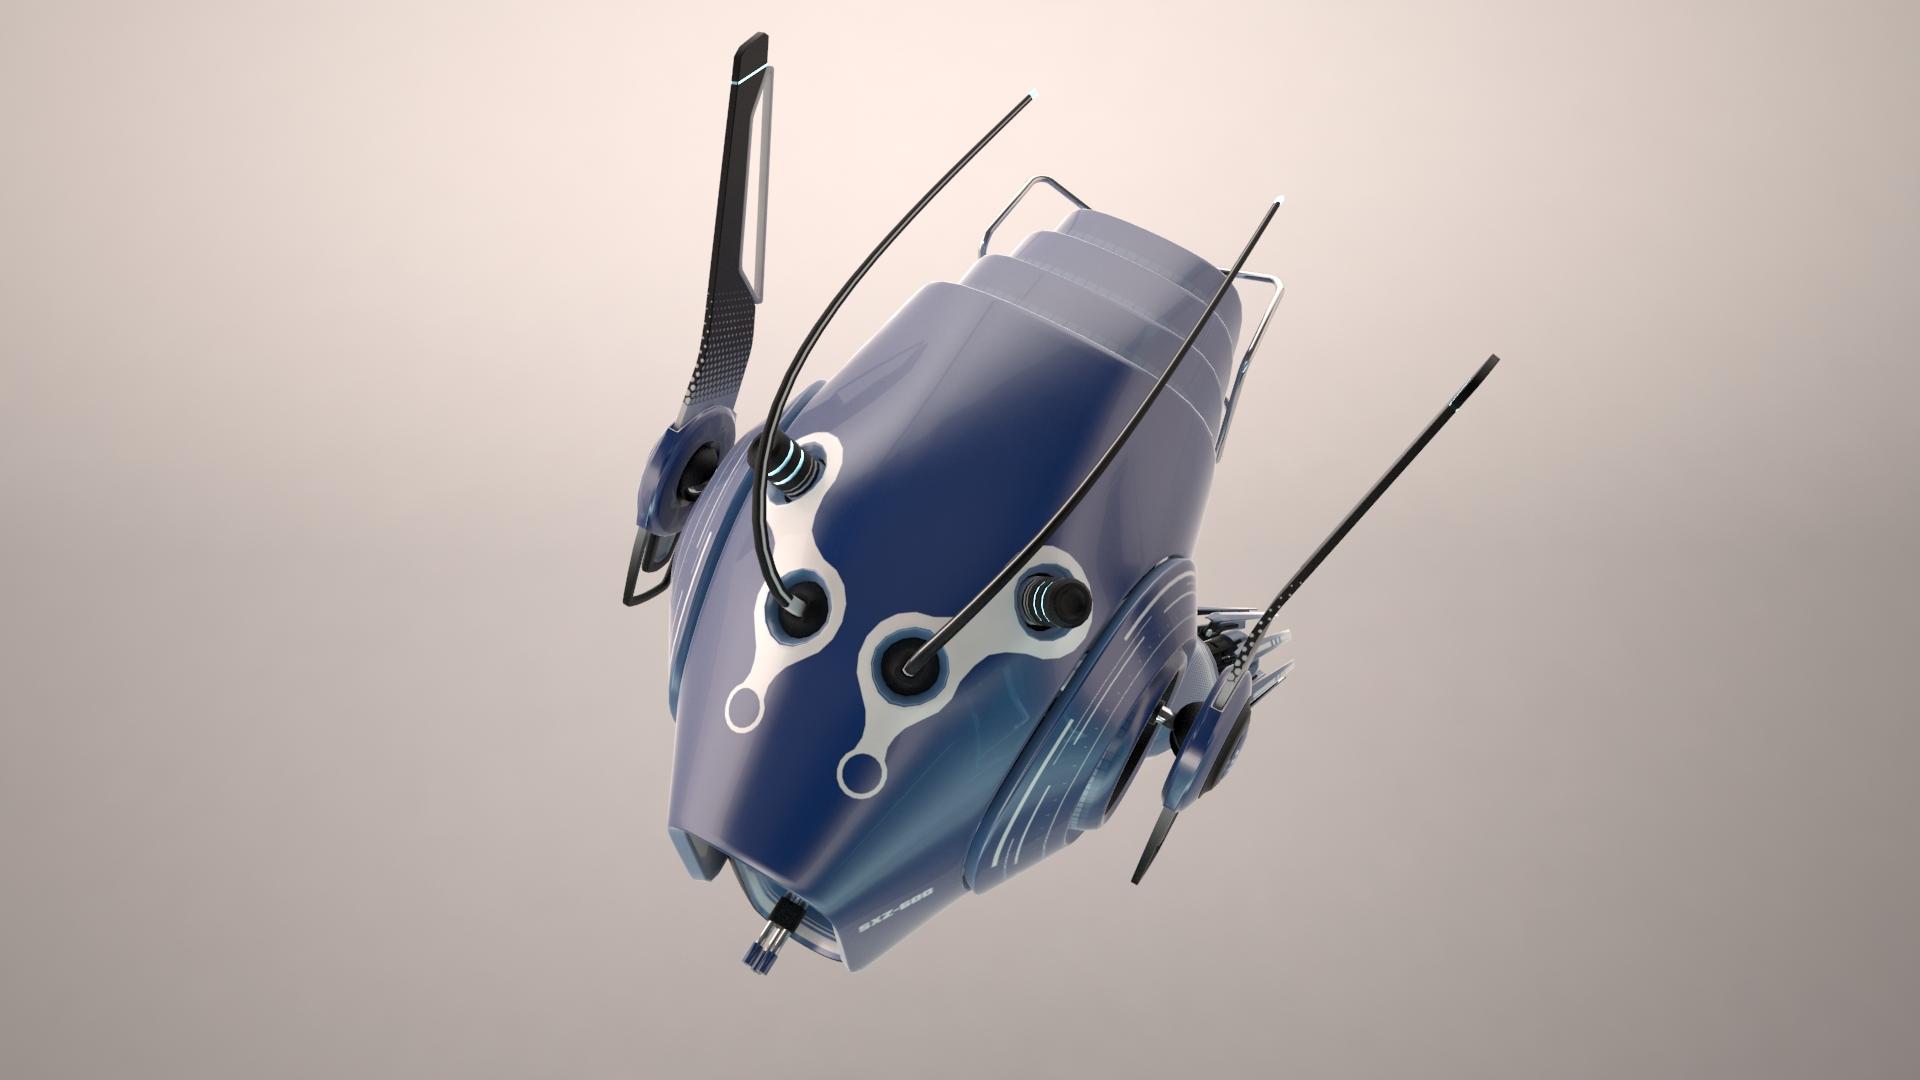 drone sxz600 3d líkan 3ds max fbx obj 267283